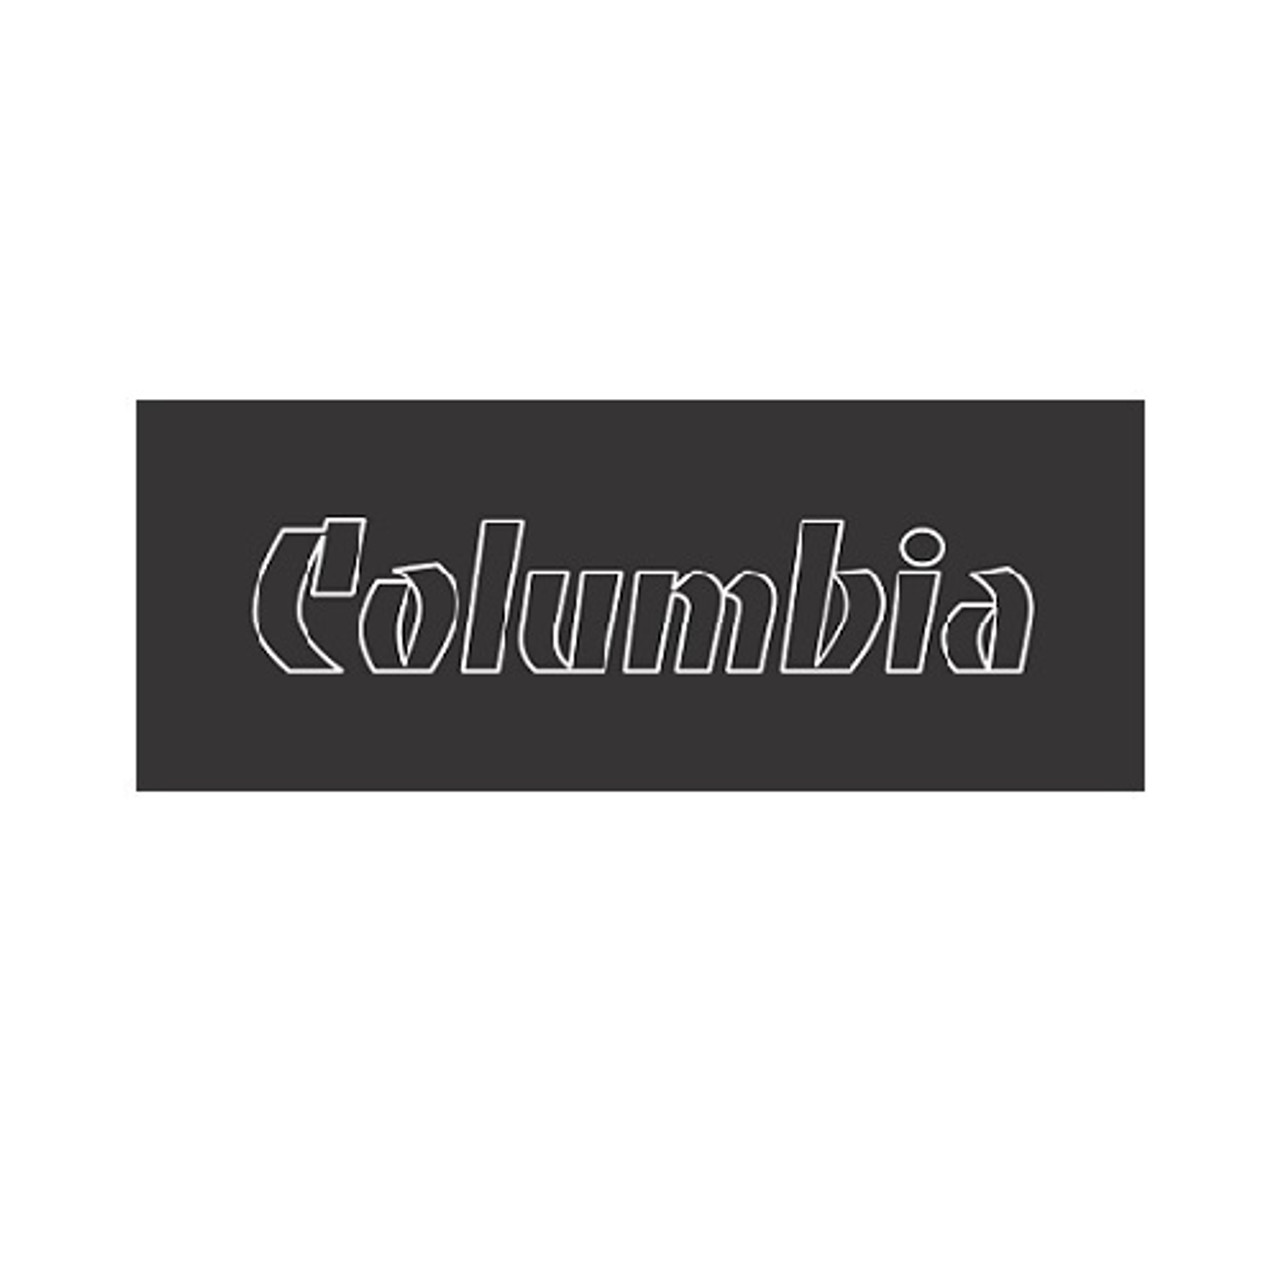 Columbia Parts